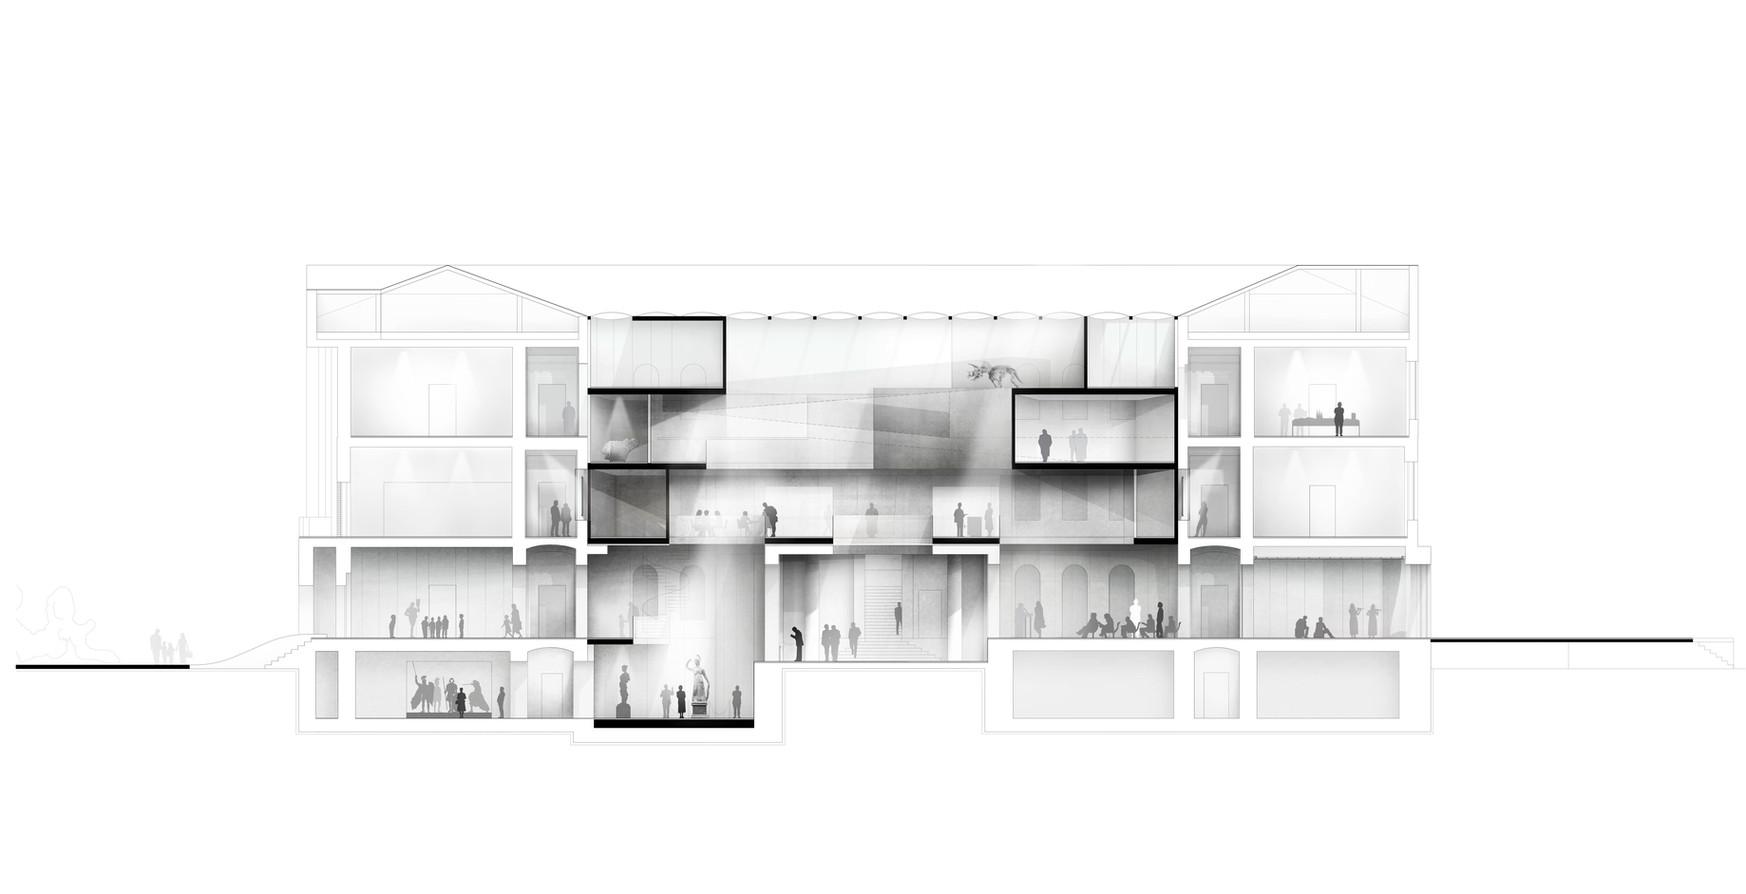 Contribution La Biennale di Venezia 2018, Palazzo Bembo, Museum Rudolfinum Klagenfurt, competition 2016